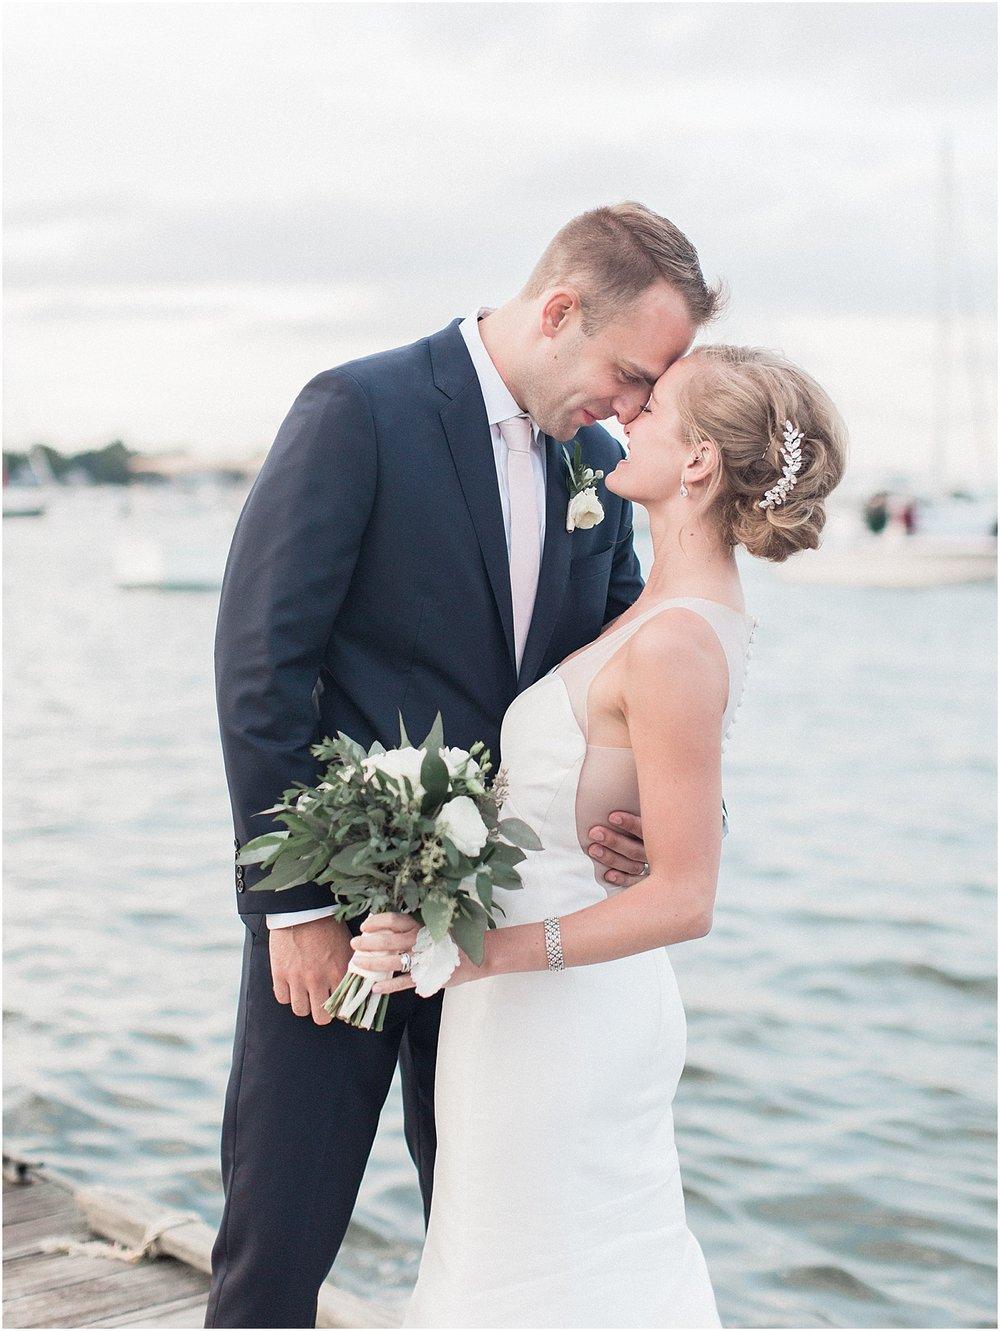 claire_gordon_duxbury_bay_maritime_school_beach_dock_powder_point_bridge_cape_cod_boston_wedding_photographer_meredith_jane_photography_photo_0606.jpg